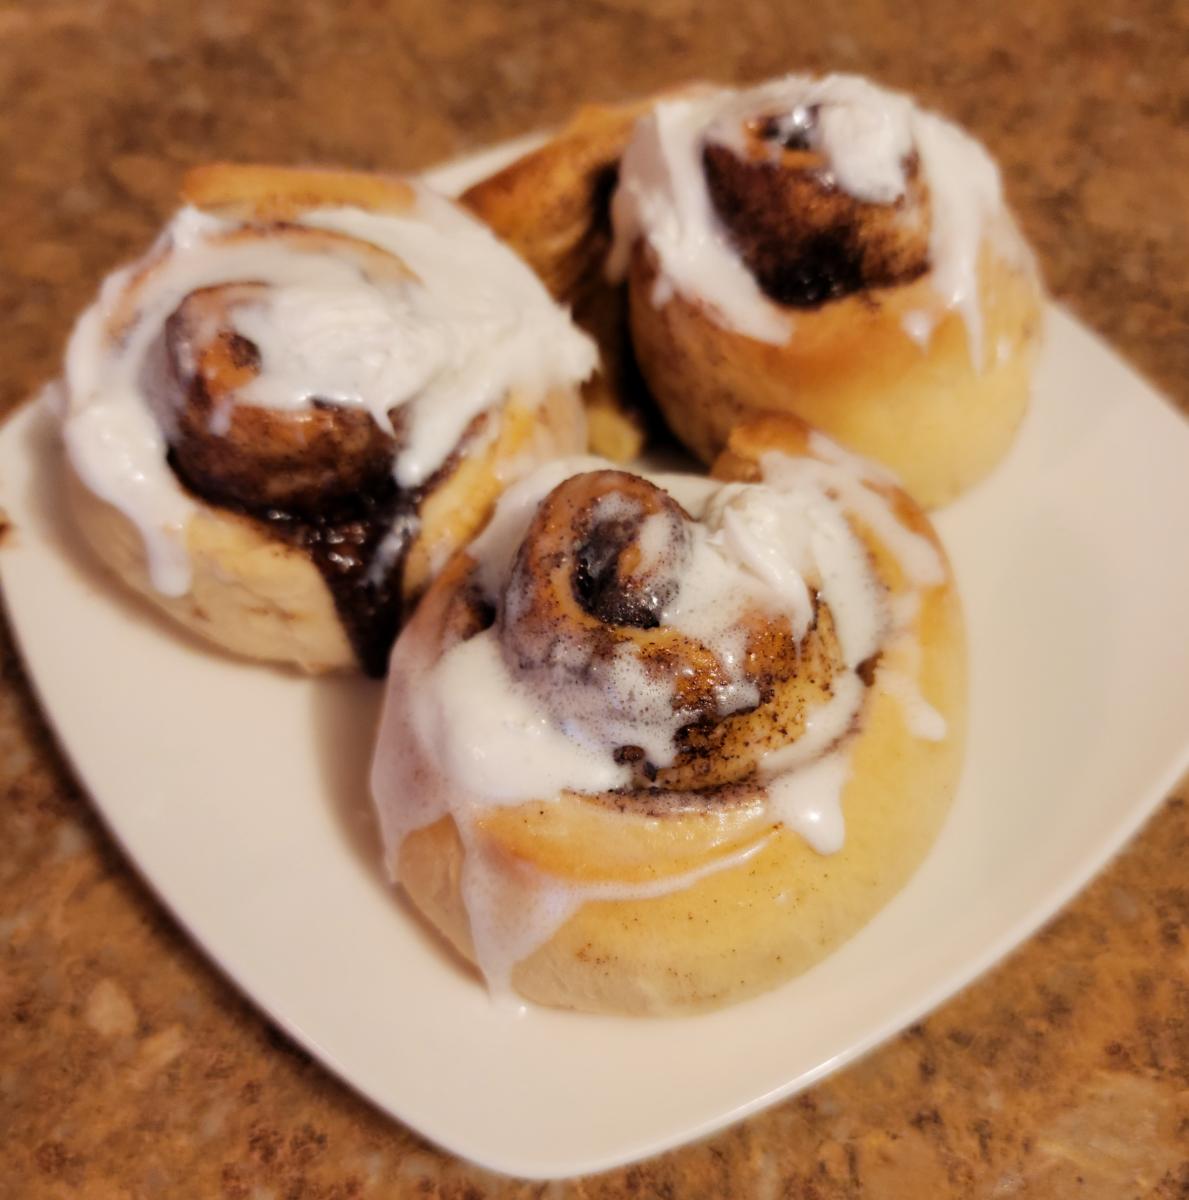 This is my husband's grandma's recipe for cinnamon buns